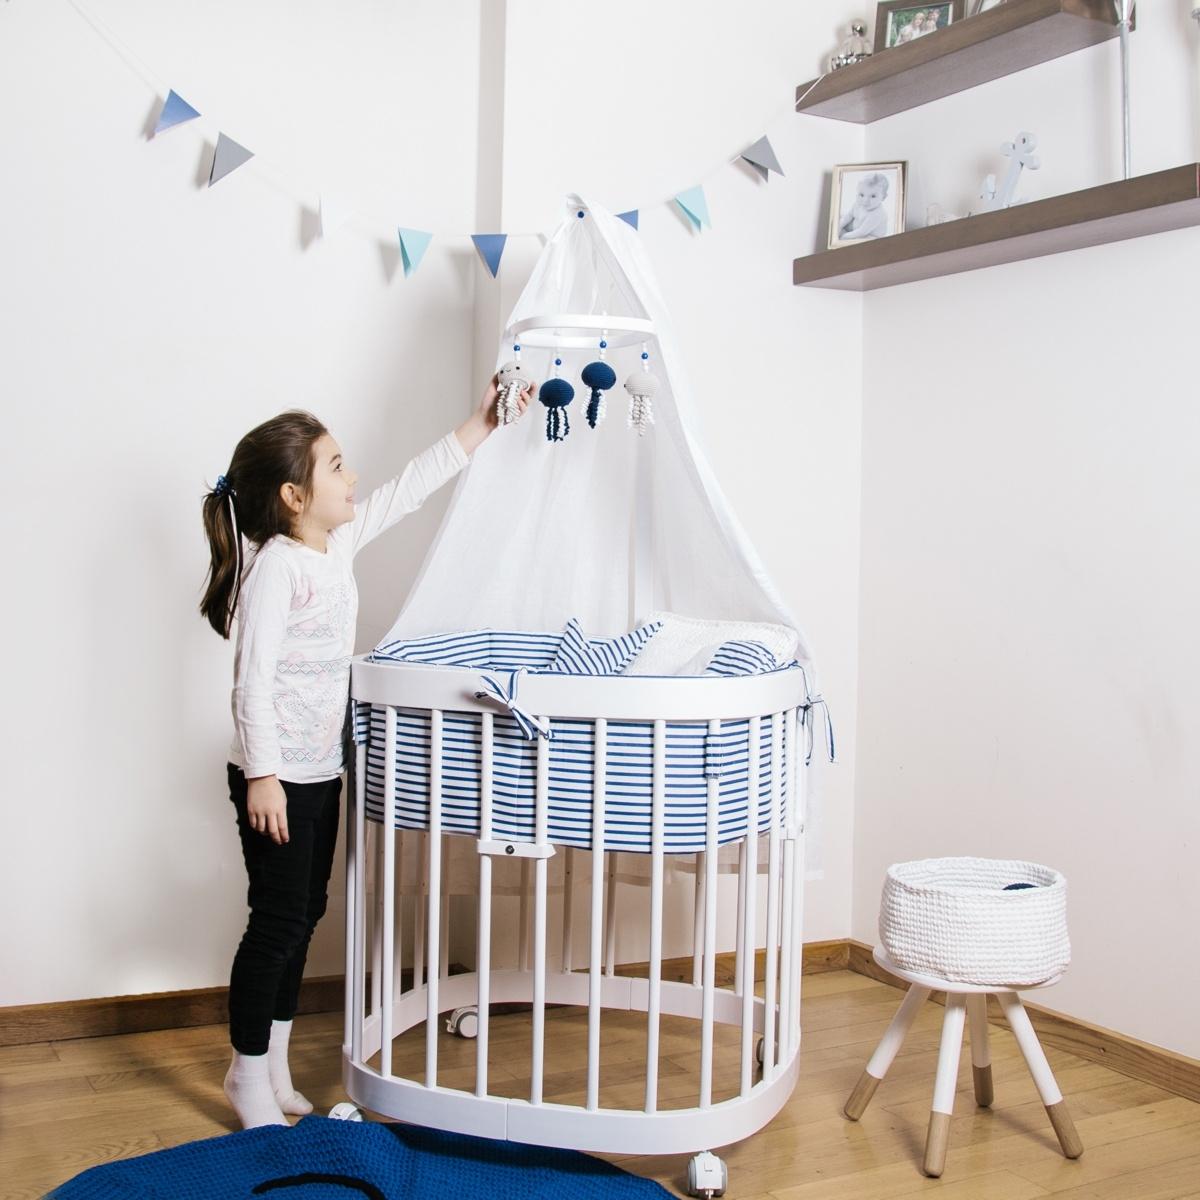 TWEETO Baby Mobile - Quallen - blau/weiss